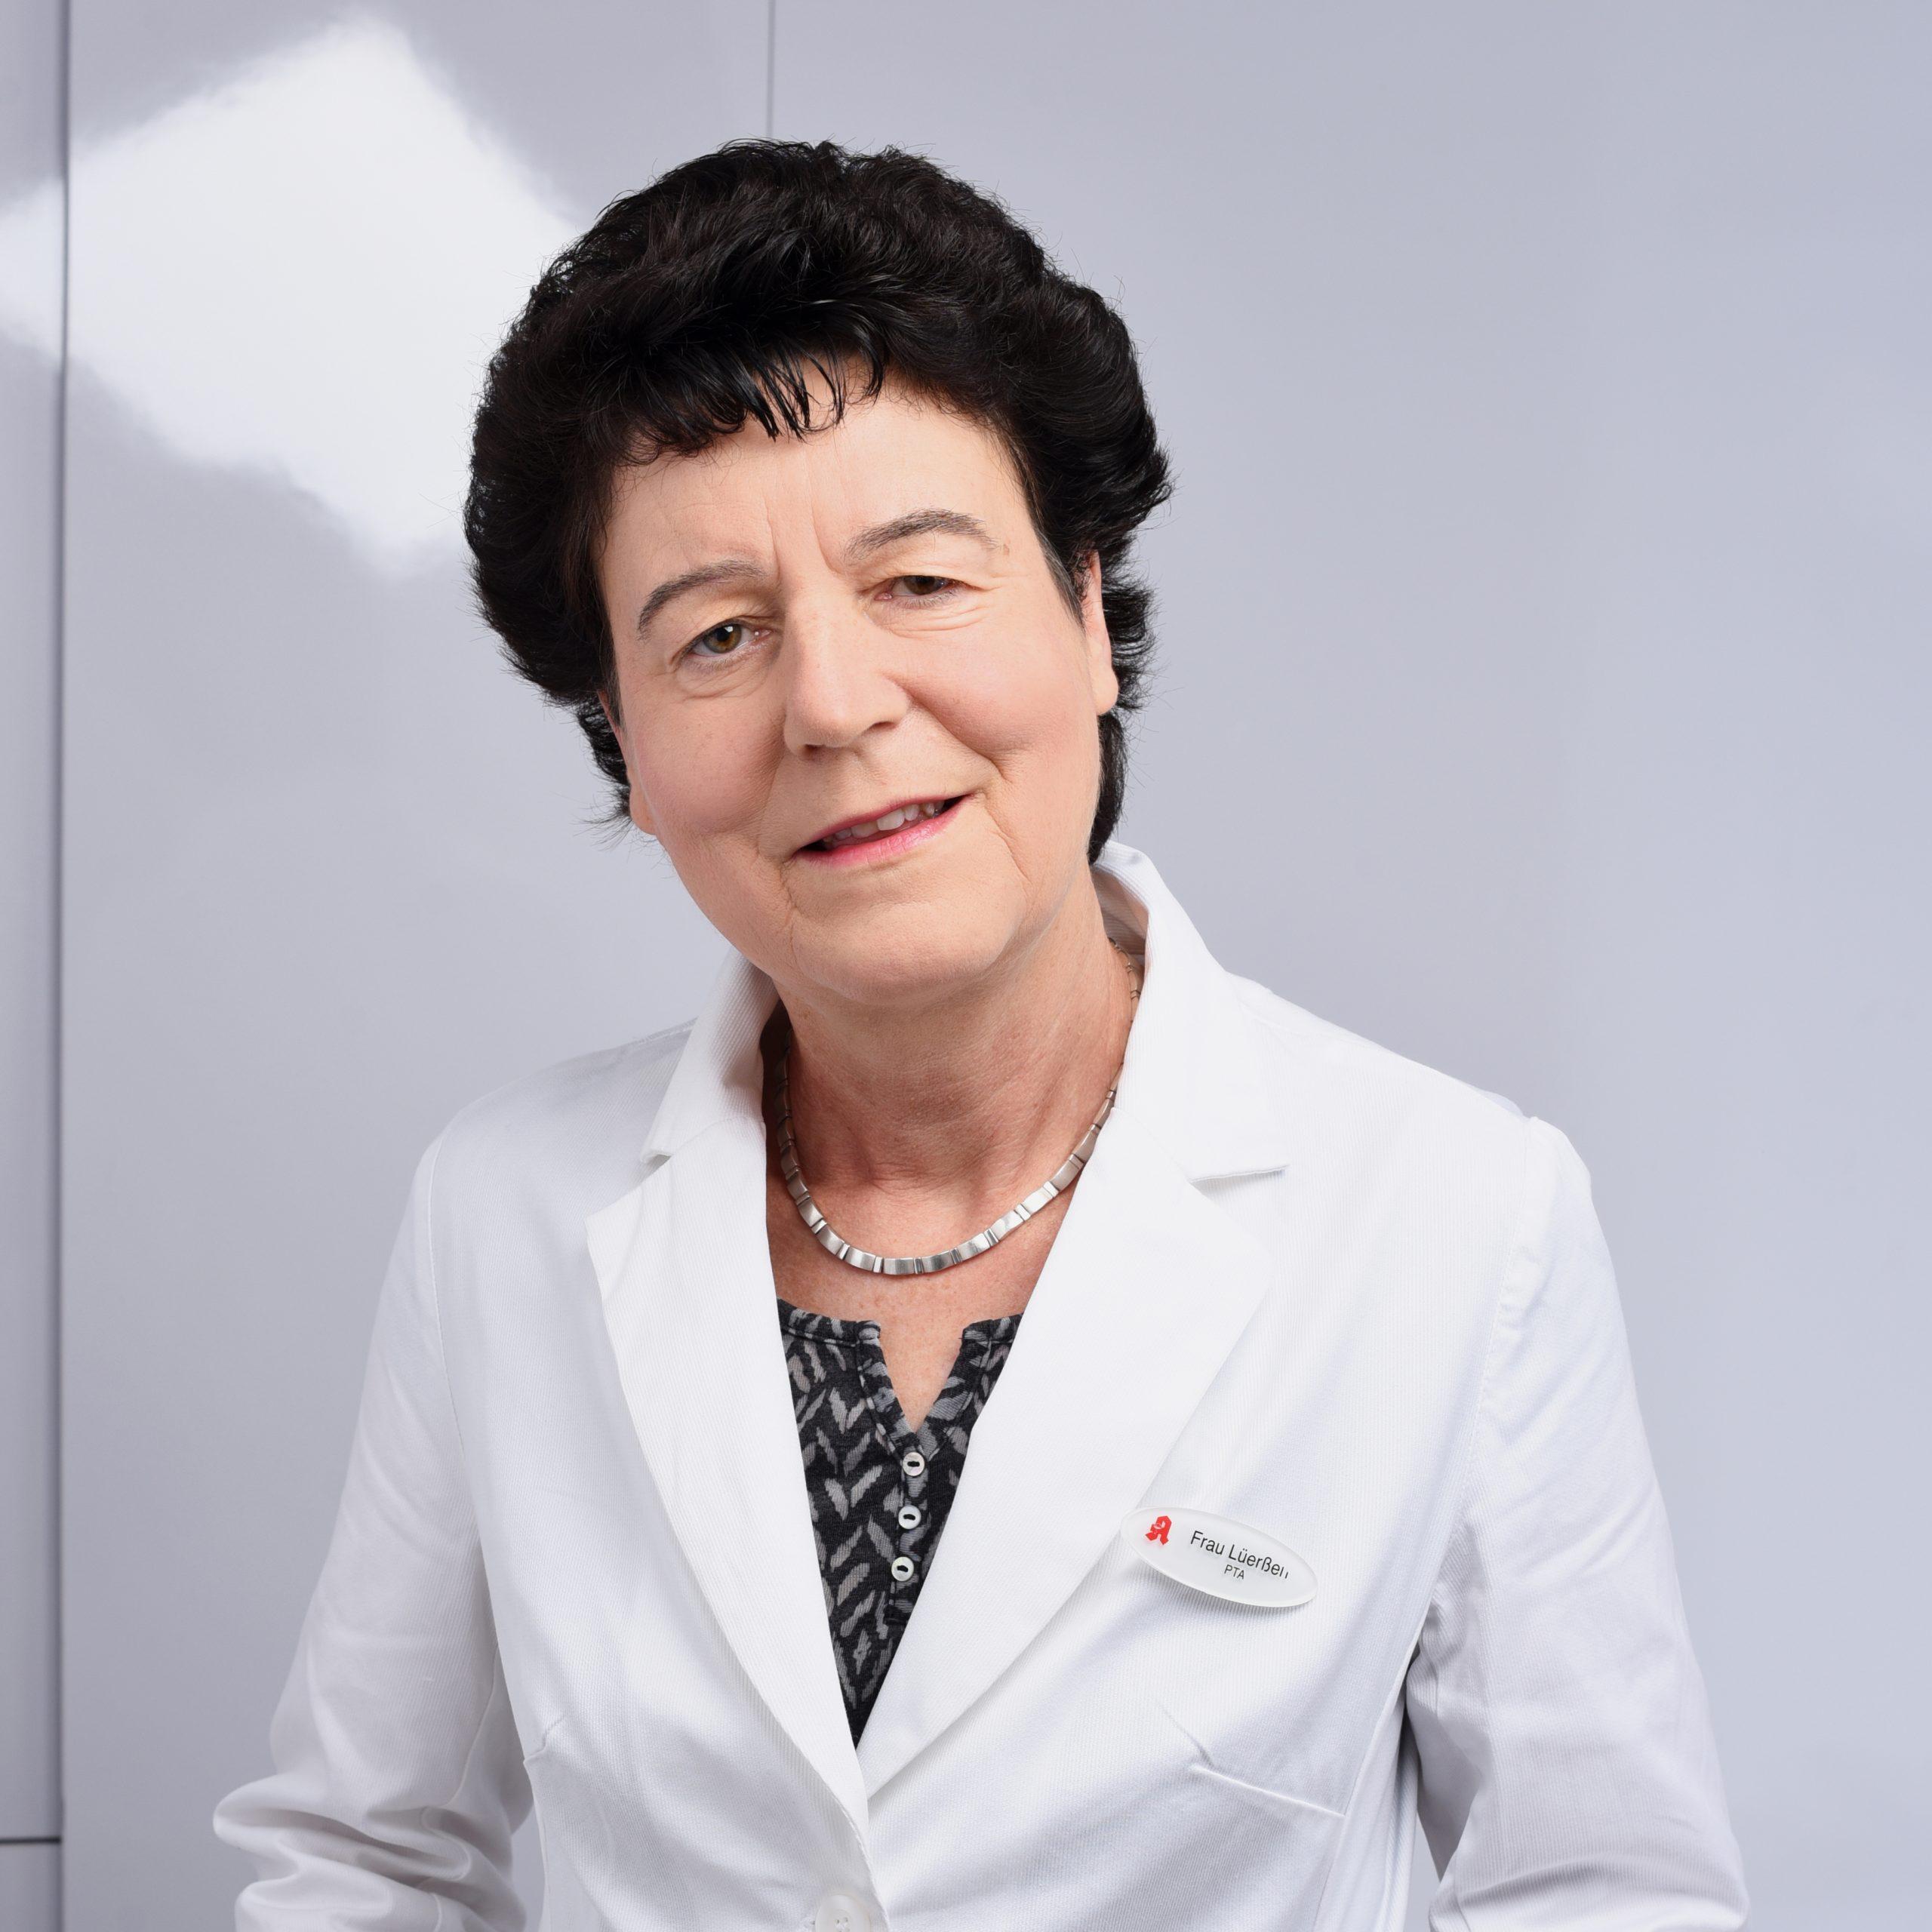 Kirsten Lüerßen